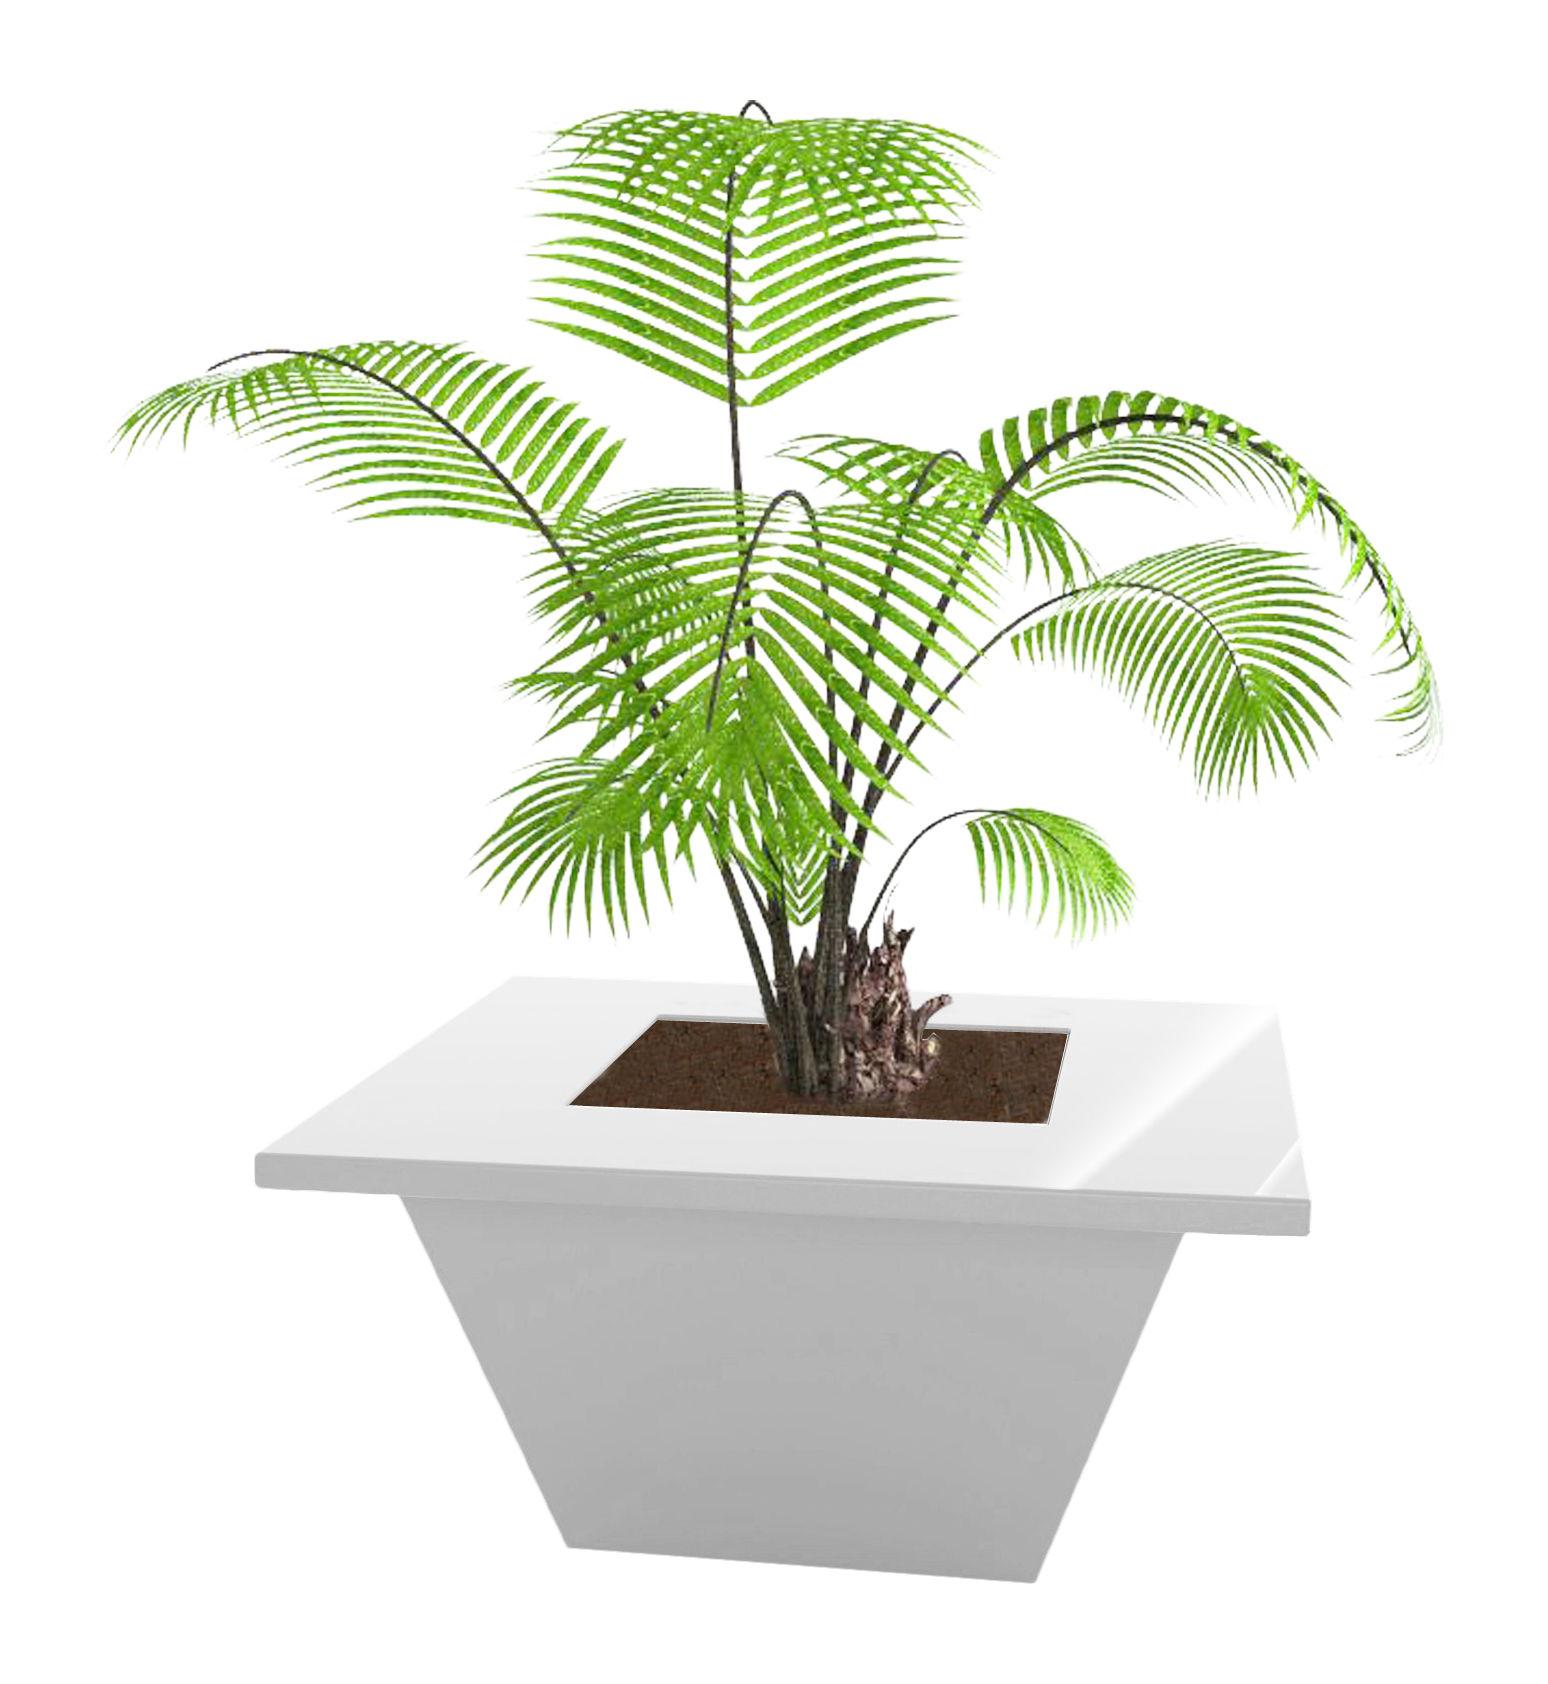 Outdoor - Töpfe und Pflanzen - Bench Blumentopf 150 x 150 cm - lackiert - Slide - Weiß lackiert - Polyéthylène recyclable laqué